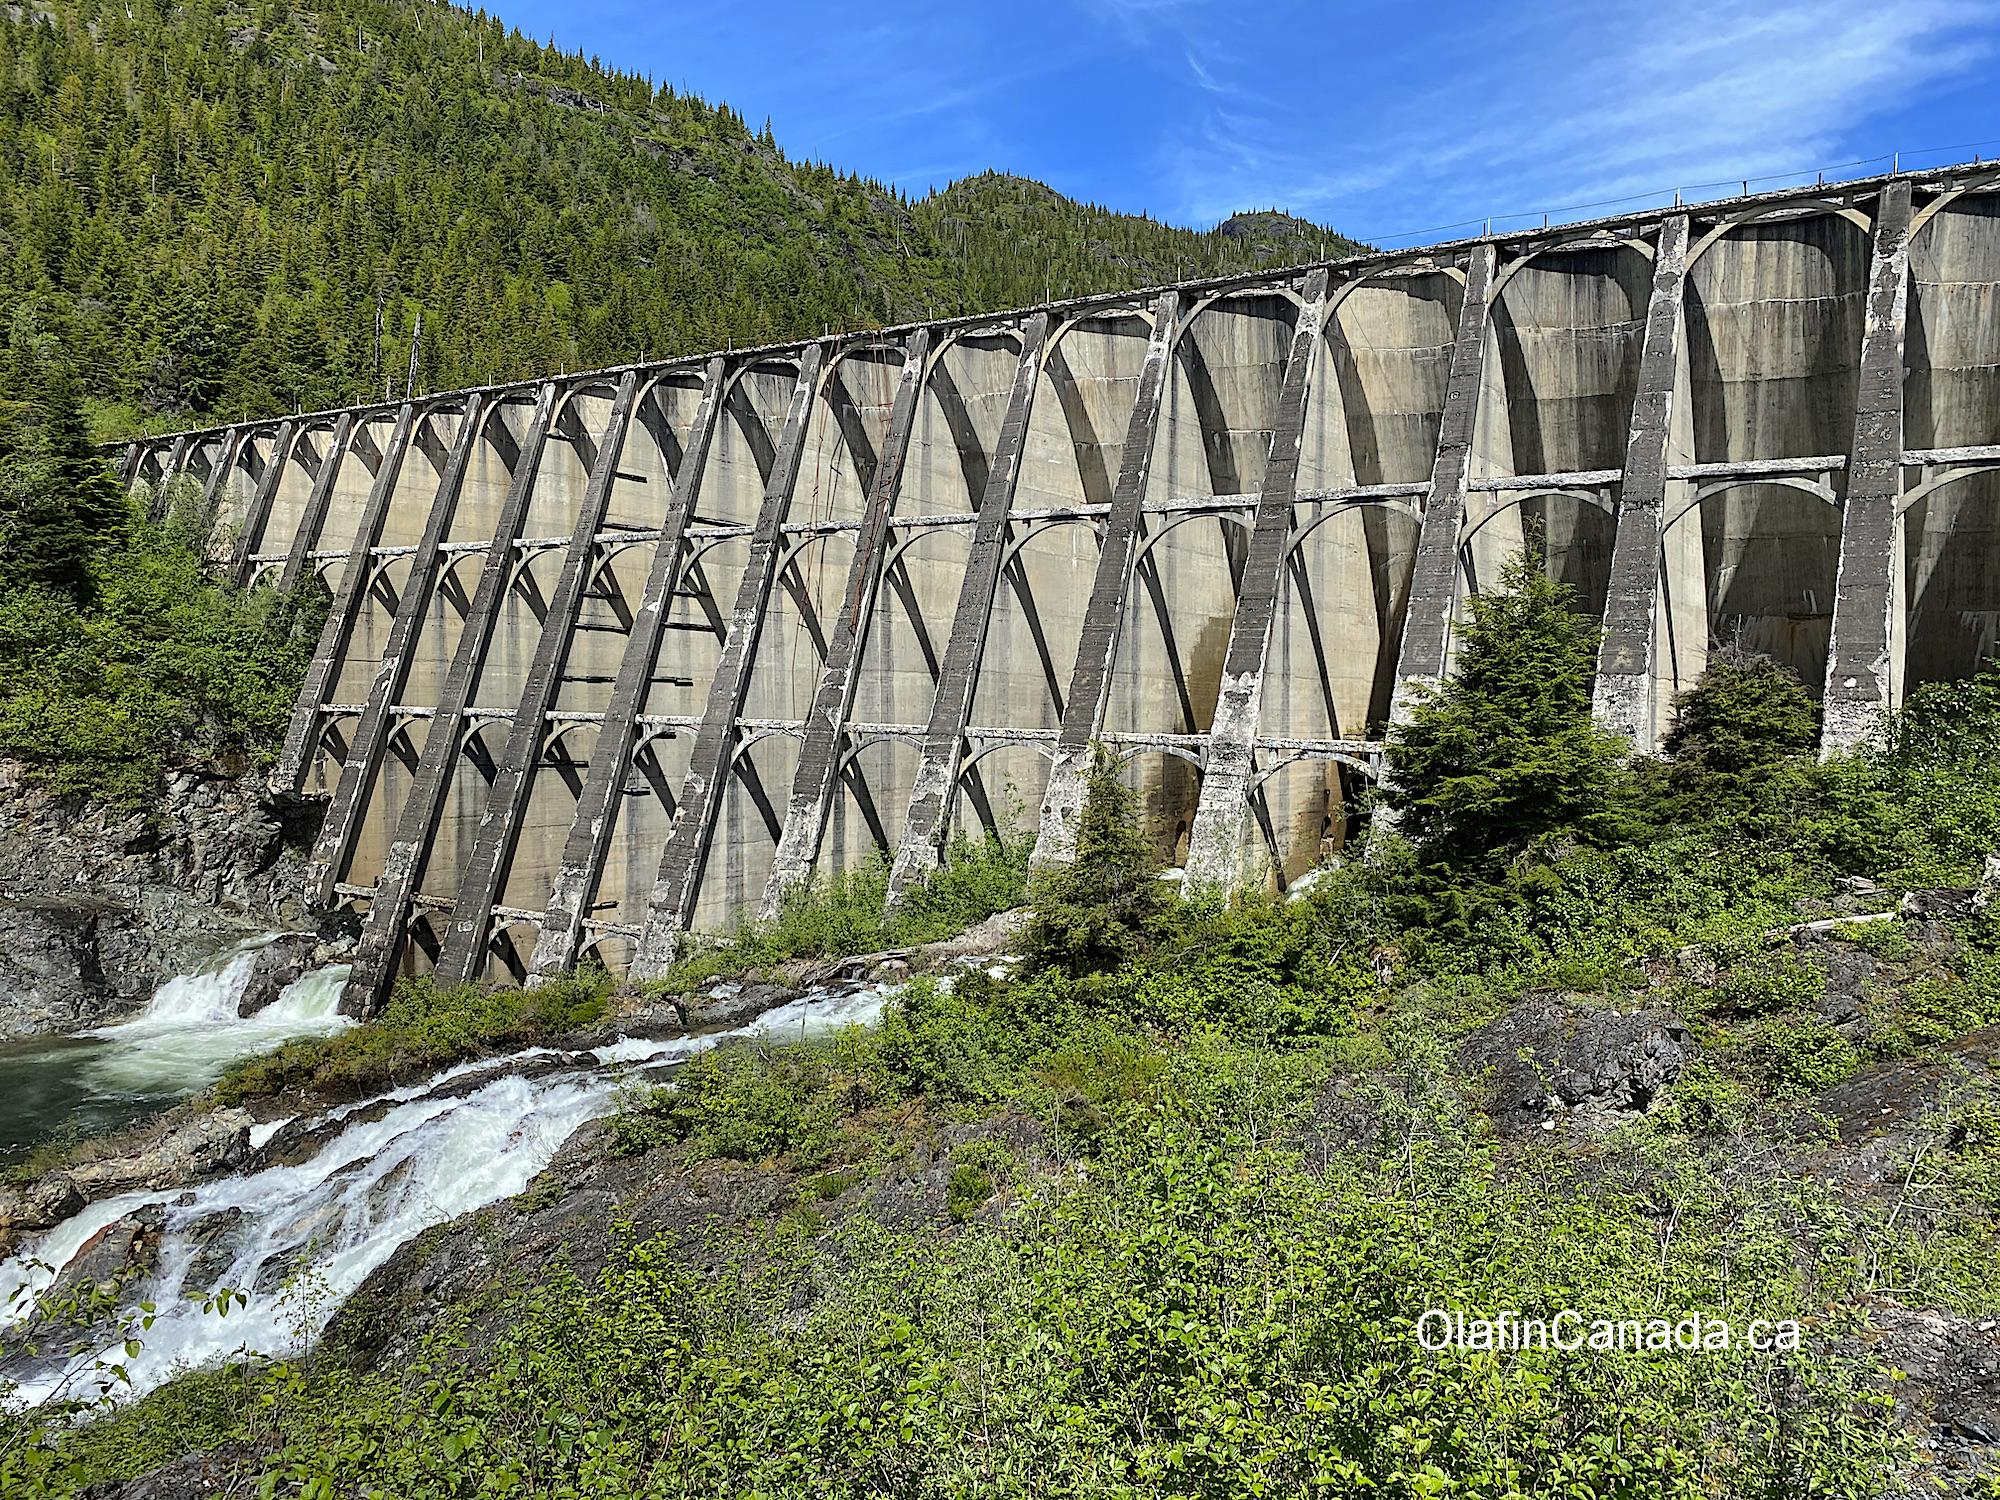 Elegant hydroelectric dam built in 1922 #olafincanada #britishcolumbia #discoverbc #abandonedbc #anyox #dam